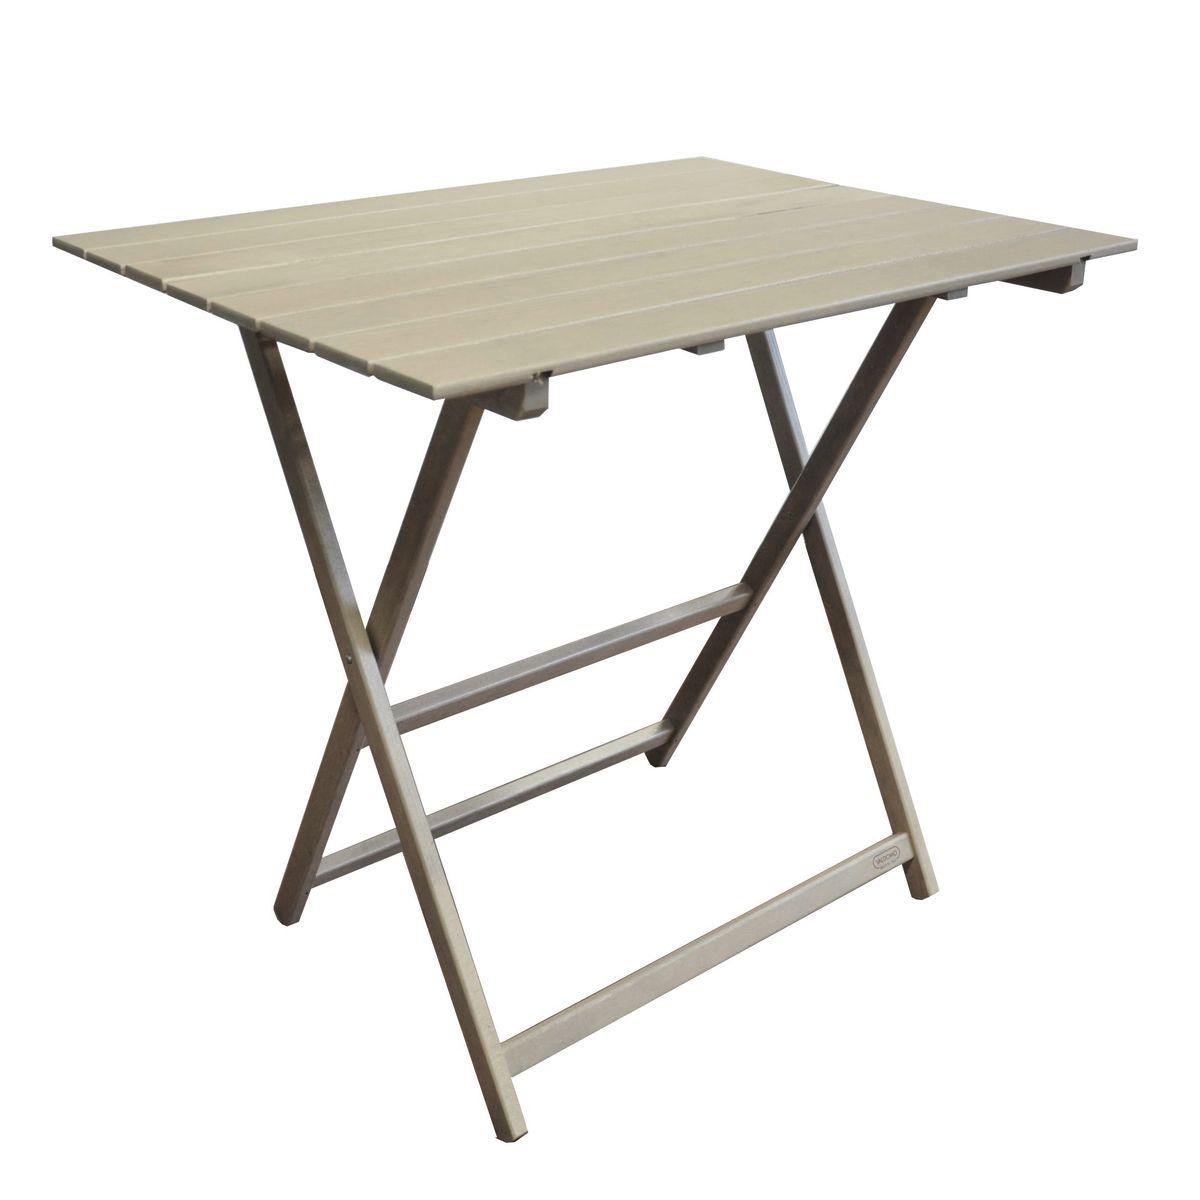 Mobili da giardino leroy merlin tavoli with mobili da for Leroy merlin tavoli esterno